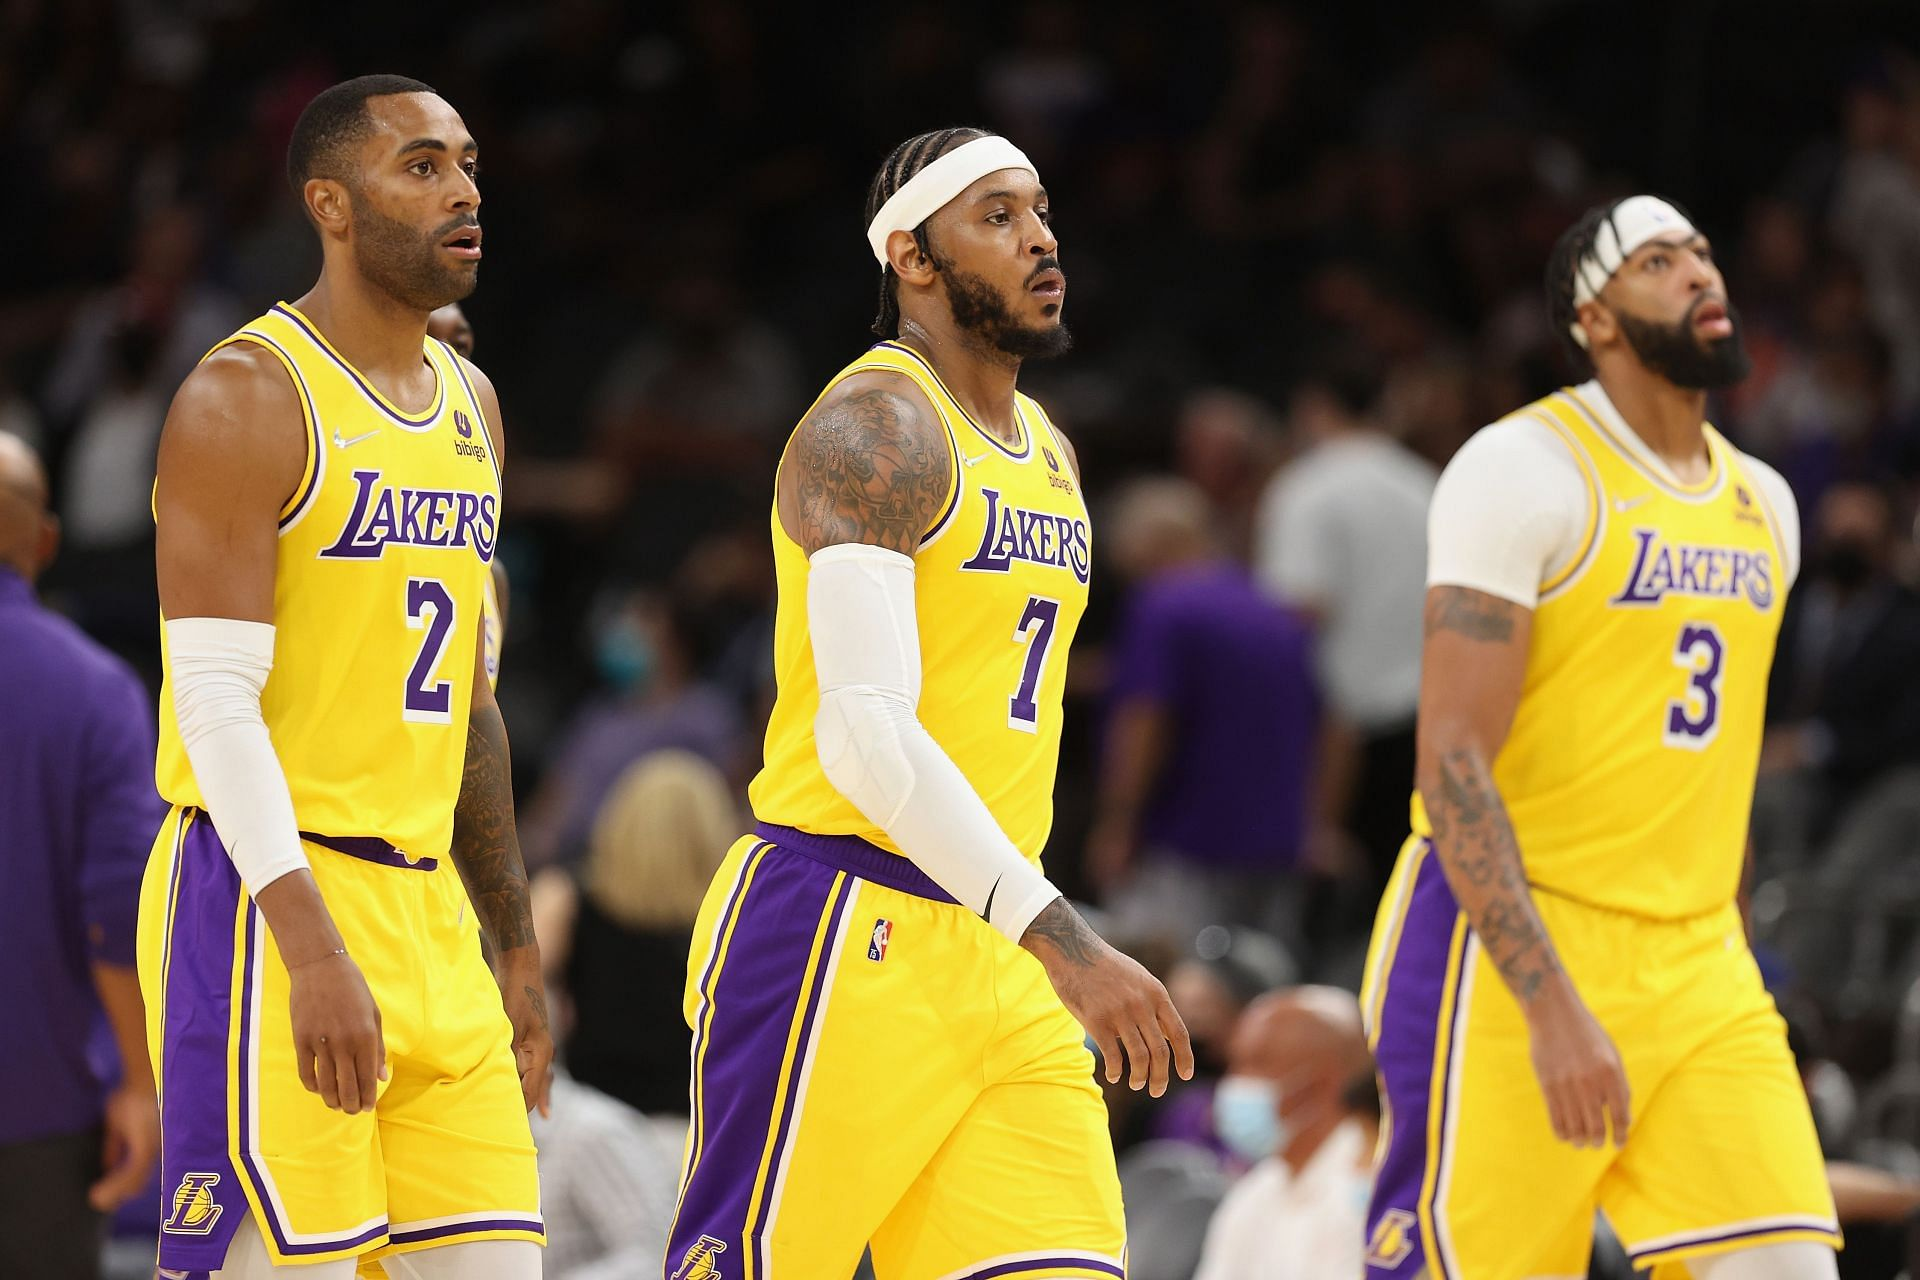 LA Lakers Wayne Ellington, Carmelo Anthony and Anthony Davis during an NBA game.